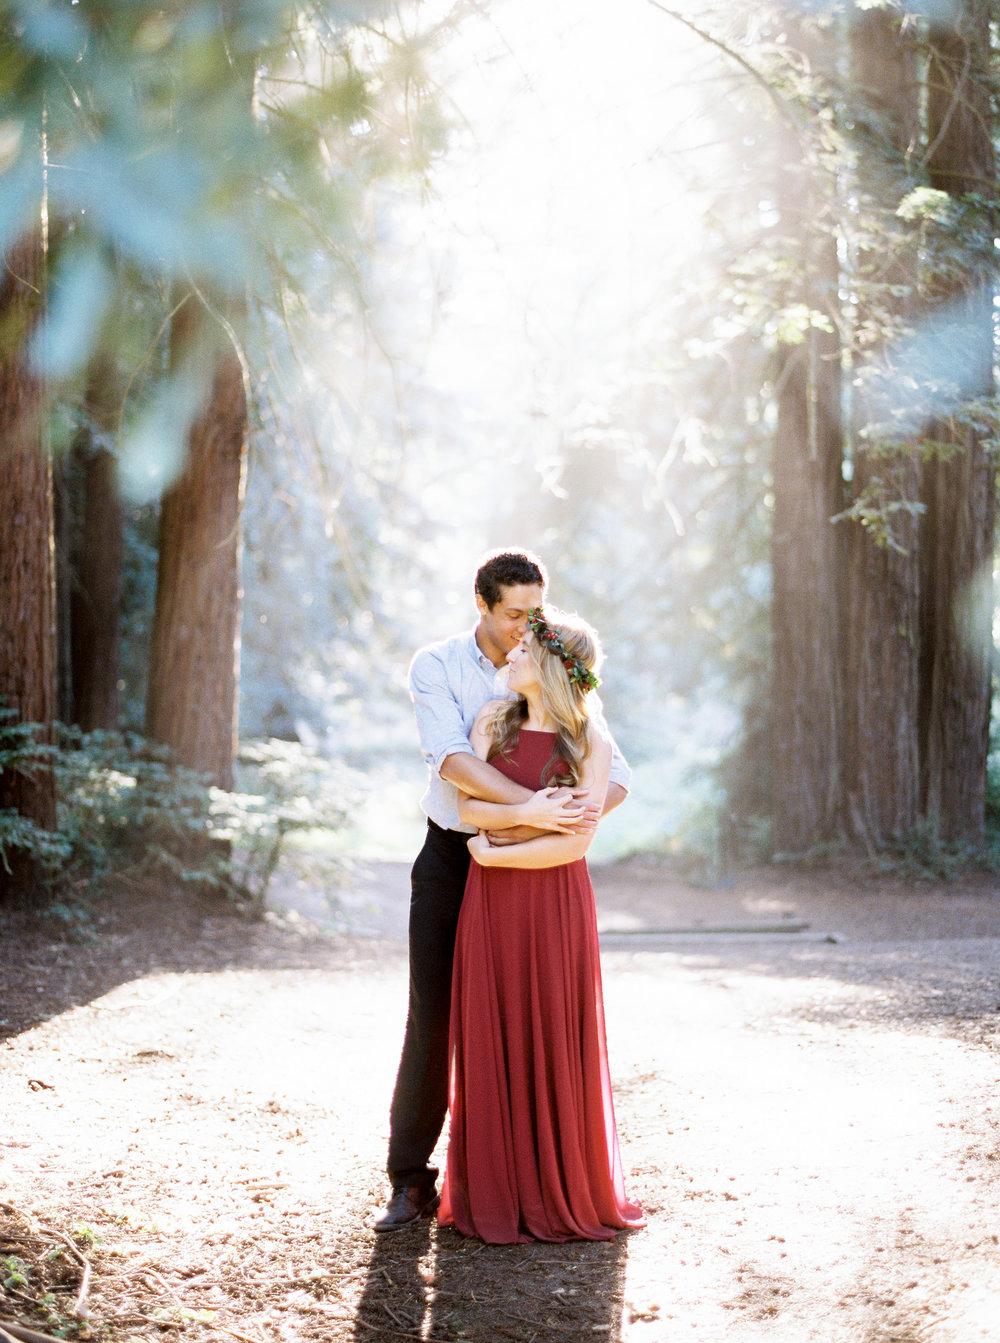 redwood-forest-engagement-in-oakland-california-20.jpg